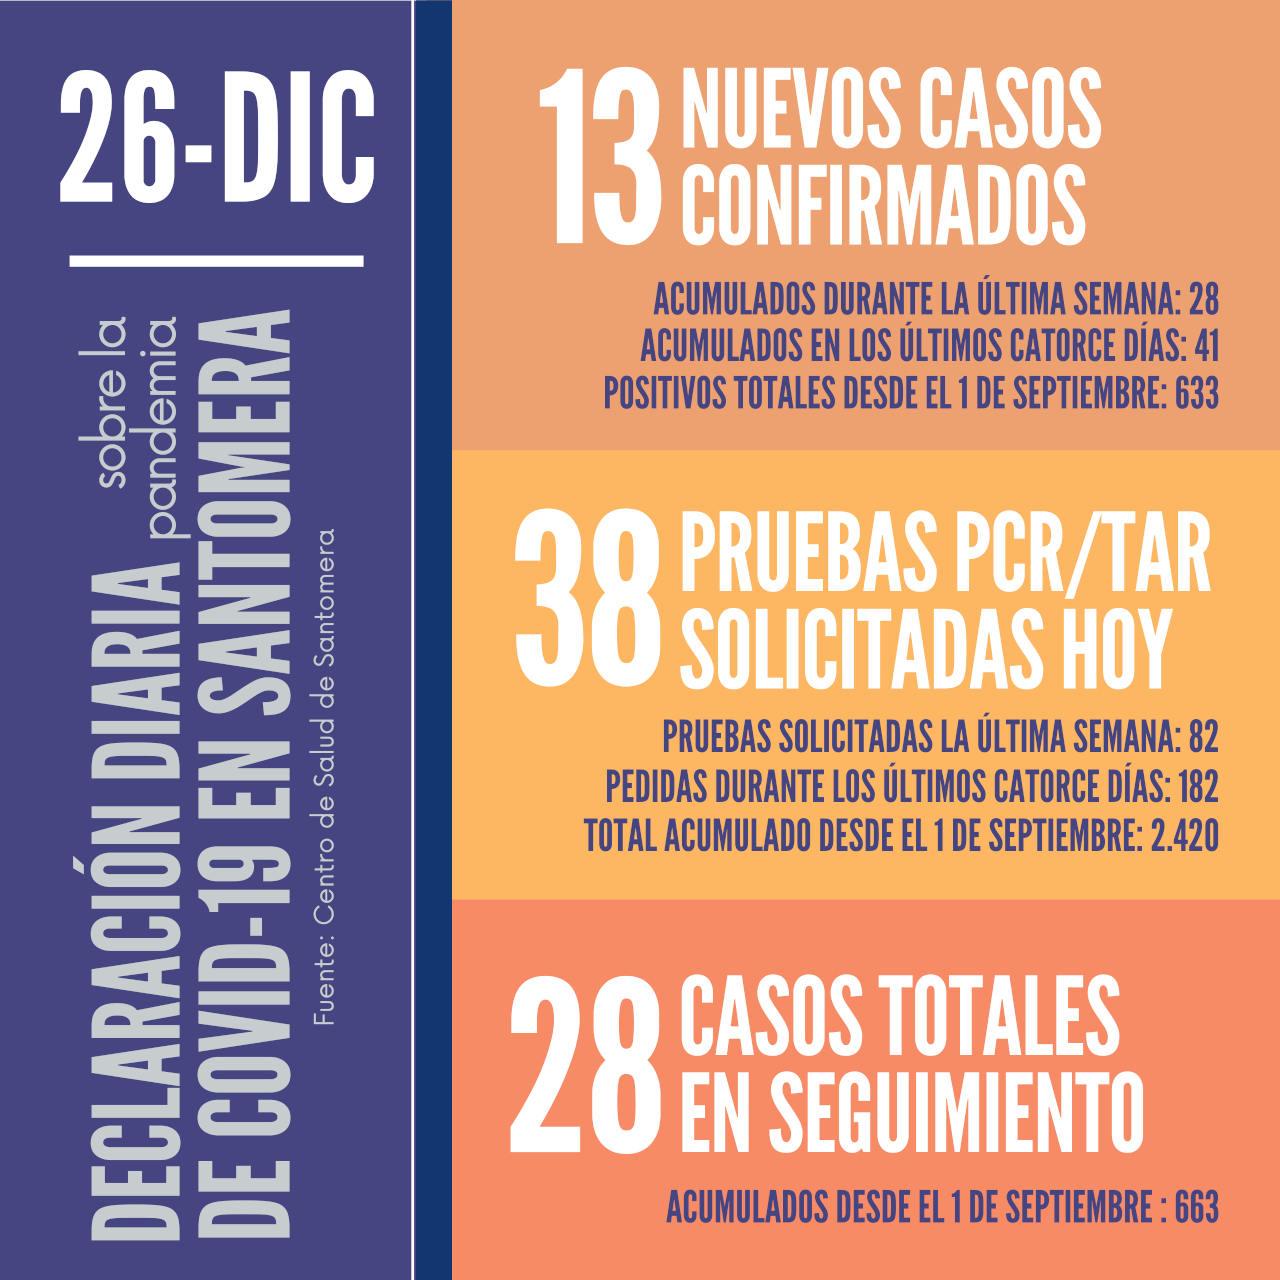 20201226_Datos COVID-19 Santomera